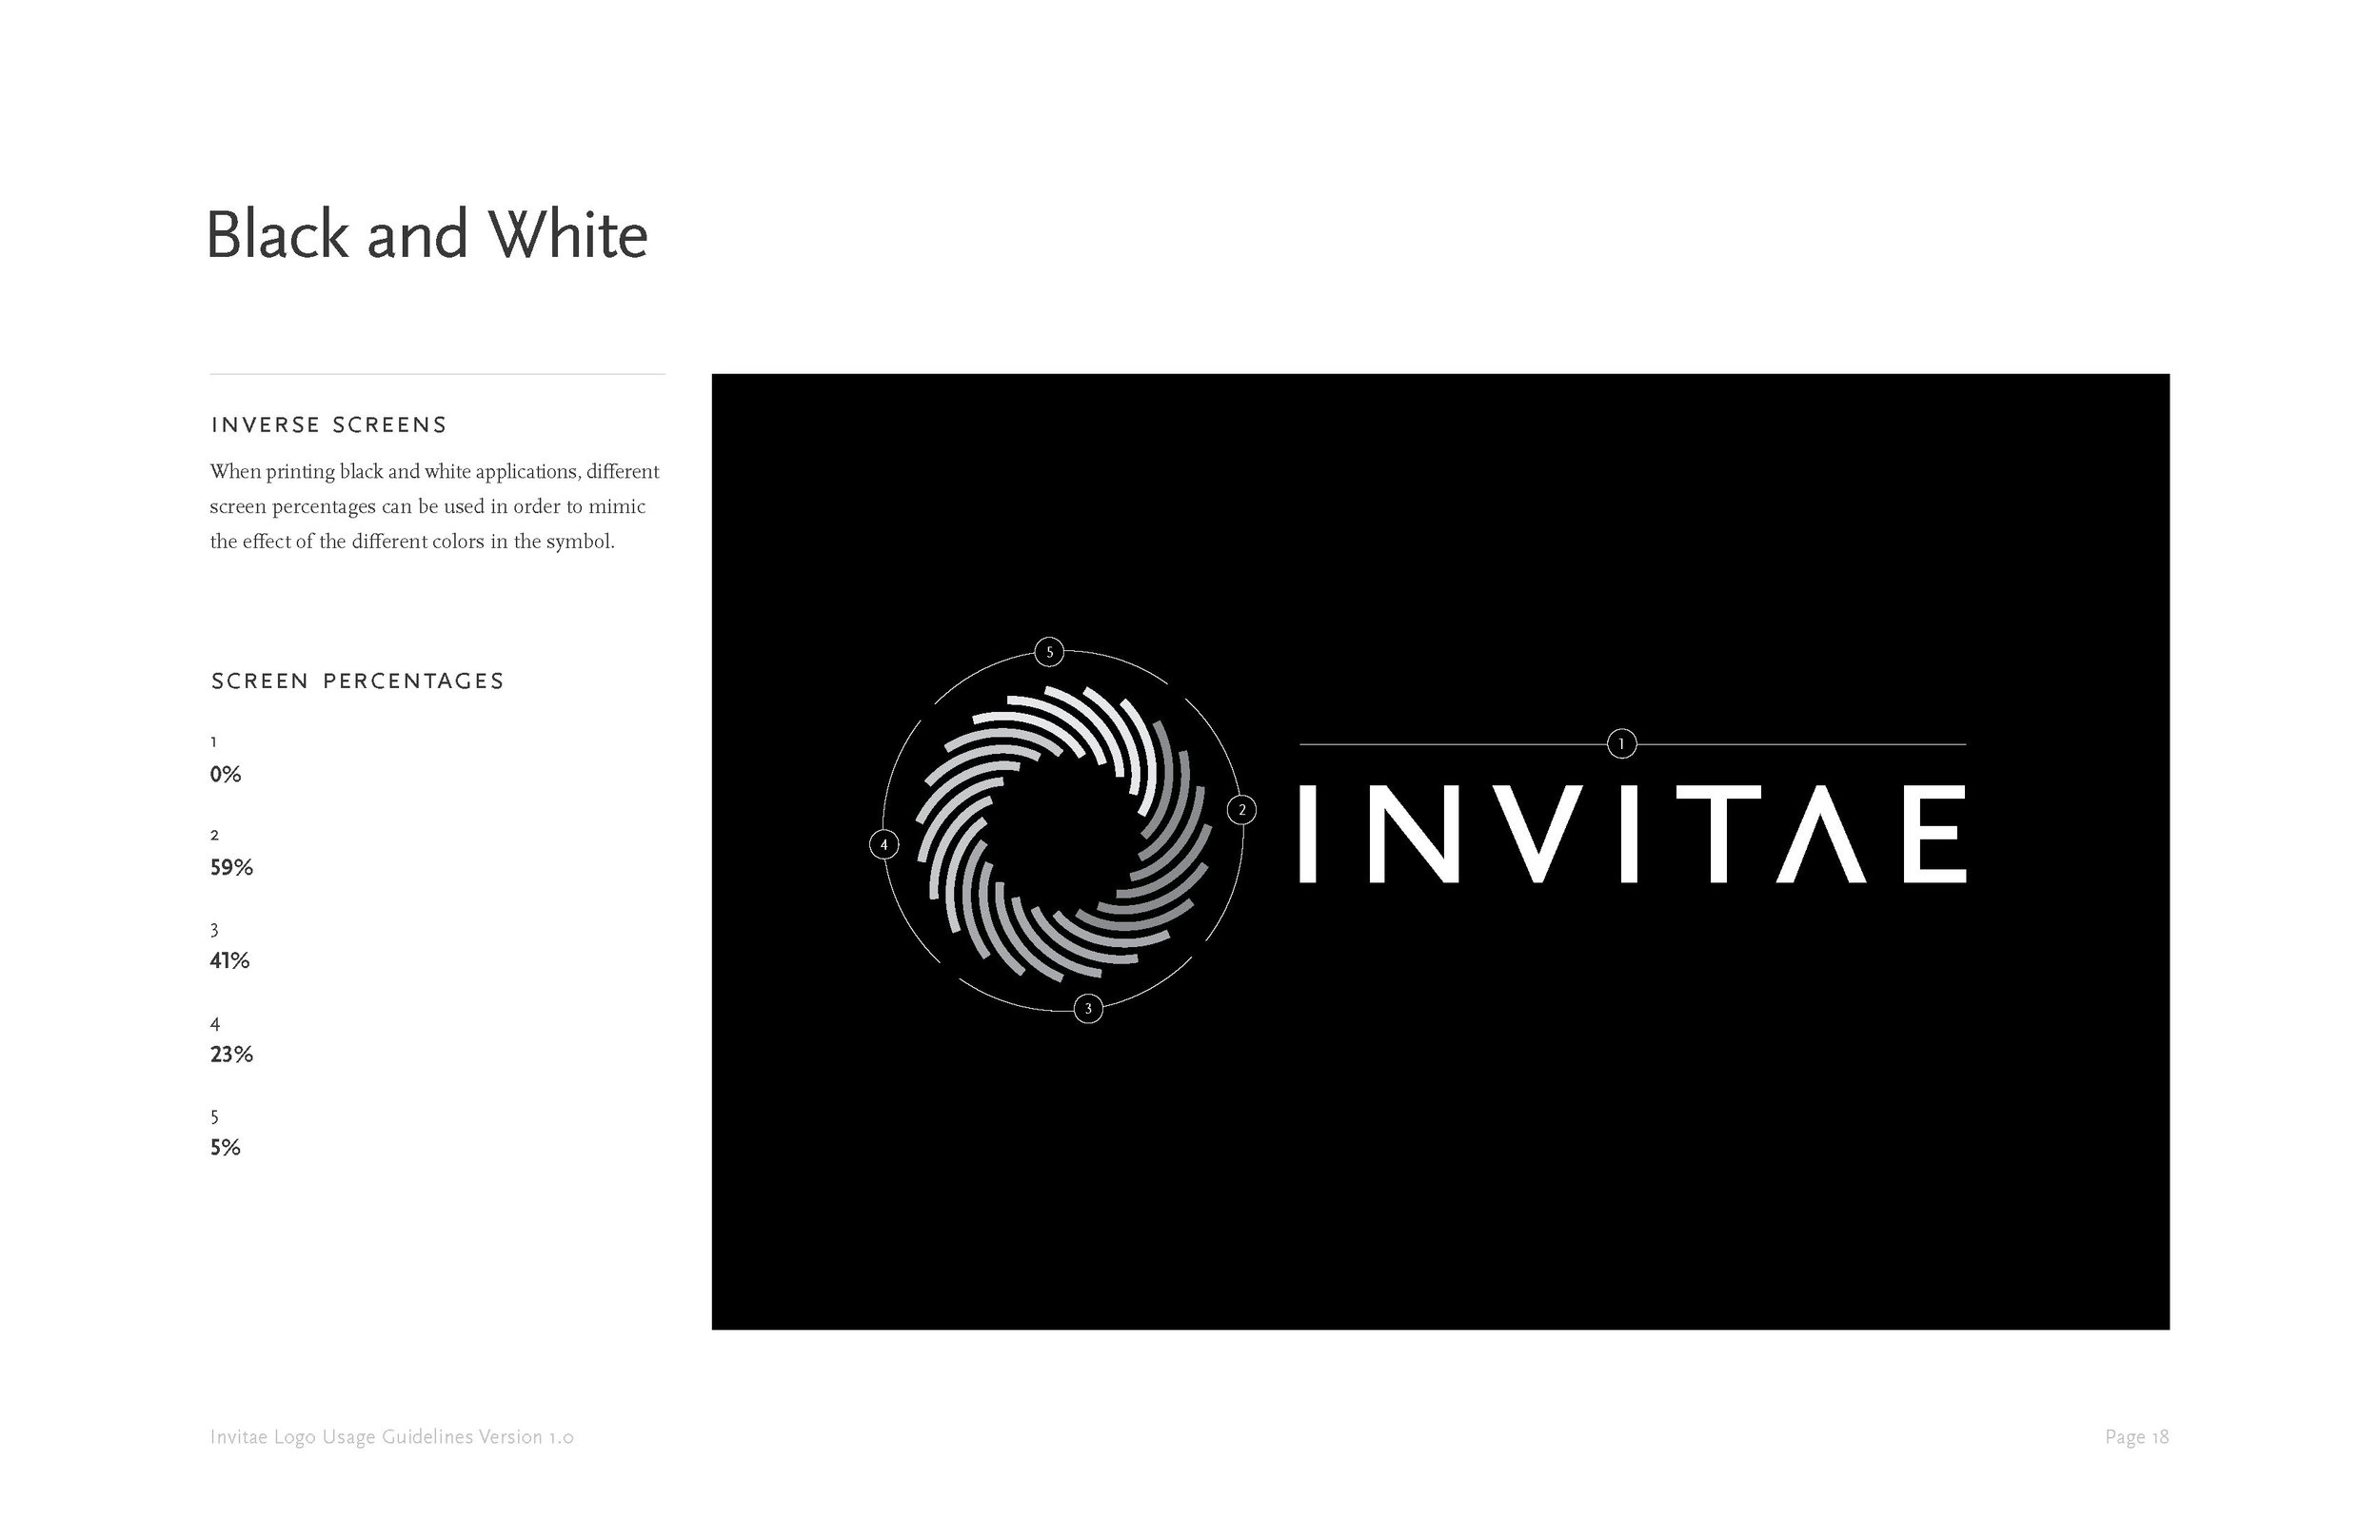 Invitae_logo_guidelines_Page_20.jpg